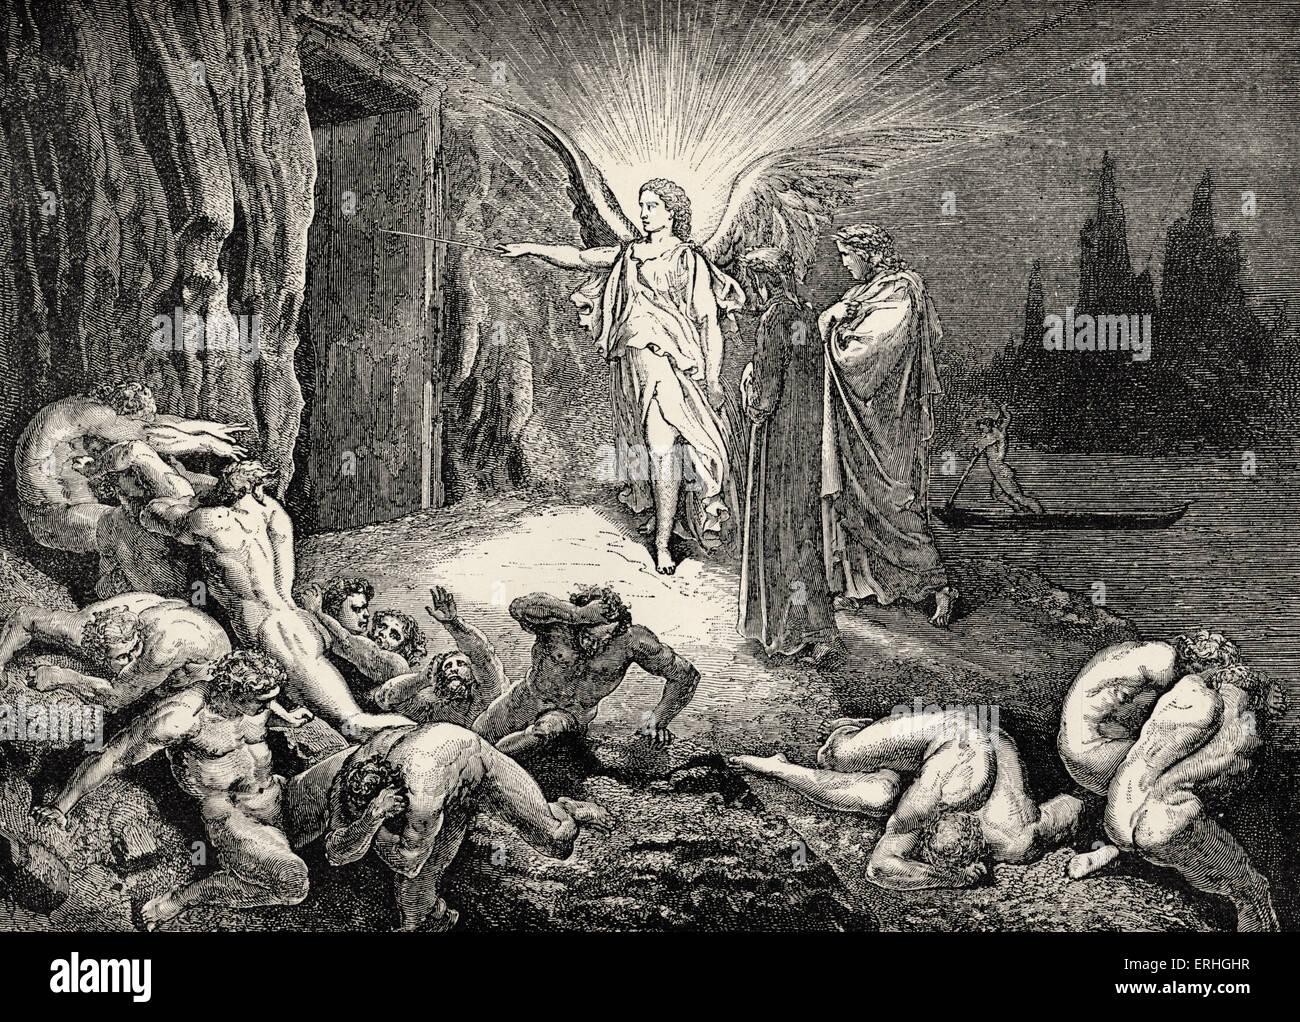 dante alighieri divina commedia essay Alighieri - divina commedia, nel mille quatro cento septe et due nel quarto mese adi cinque et sei the divine comedy by dante alighieri (folio 27v.